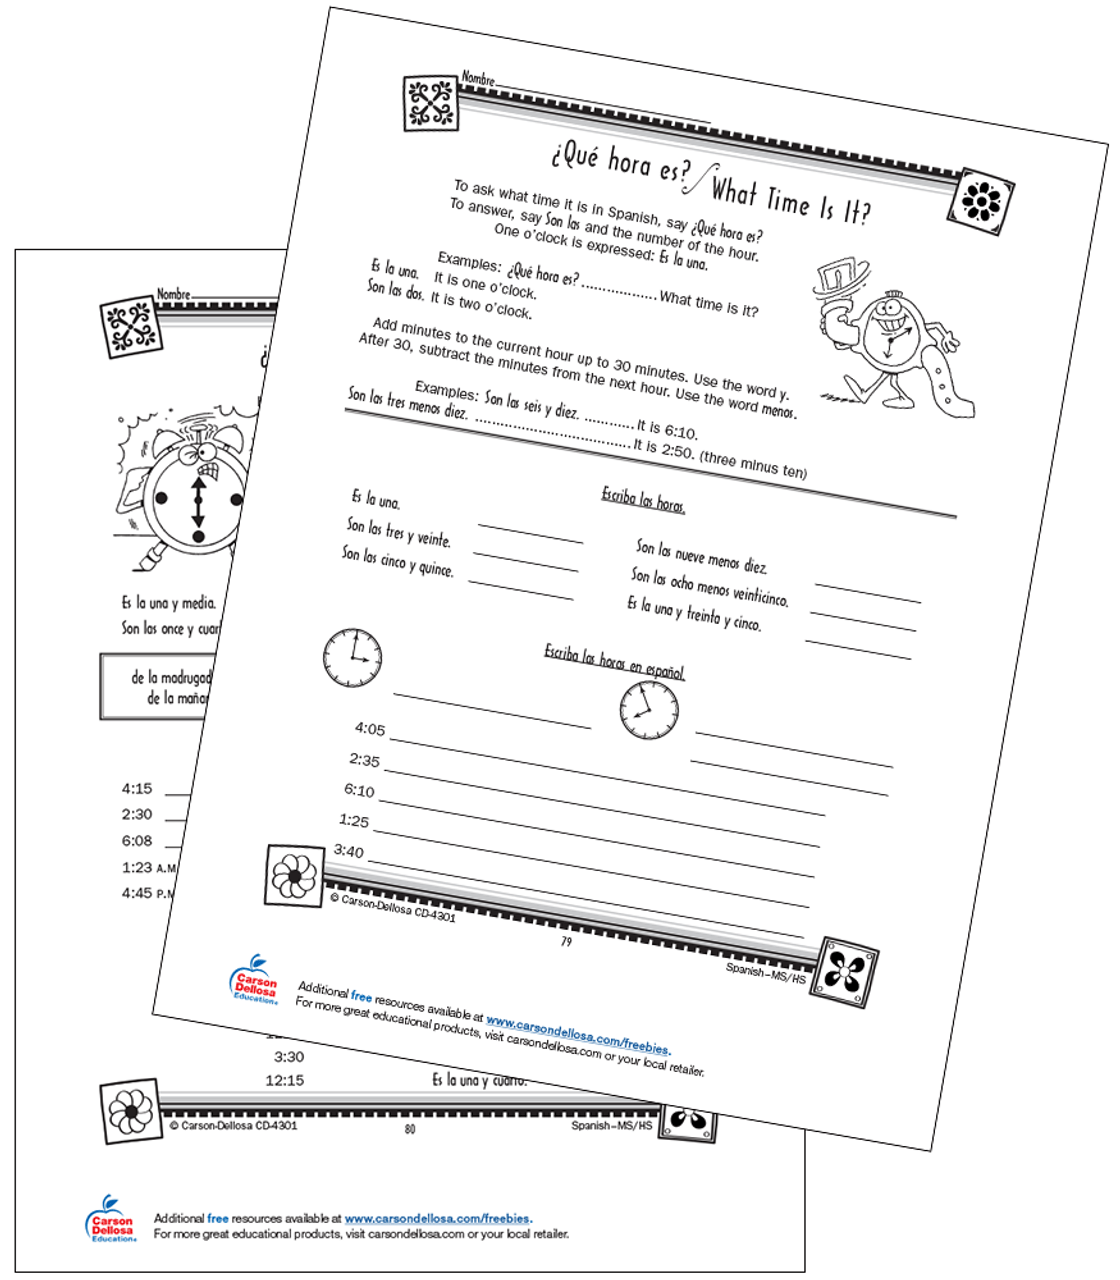 medium resolution of Time Vocabulary and Expressions Grade 6-12 Spanish Free Printable   Carson  Dellosa